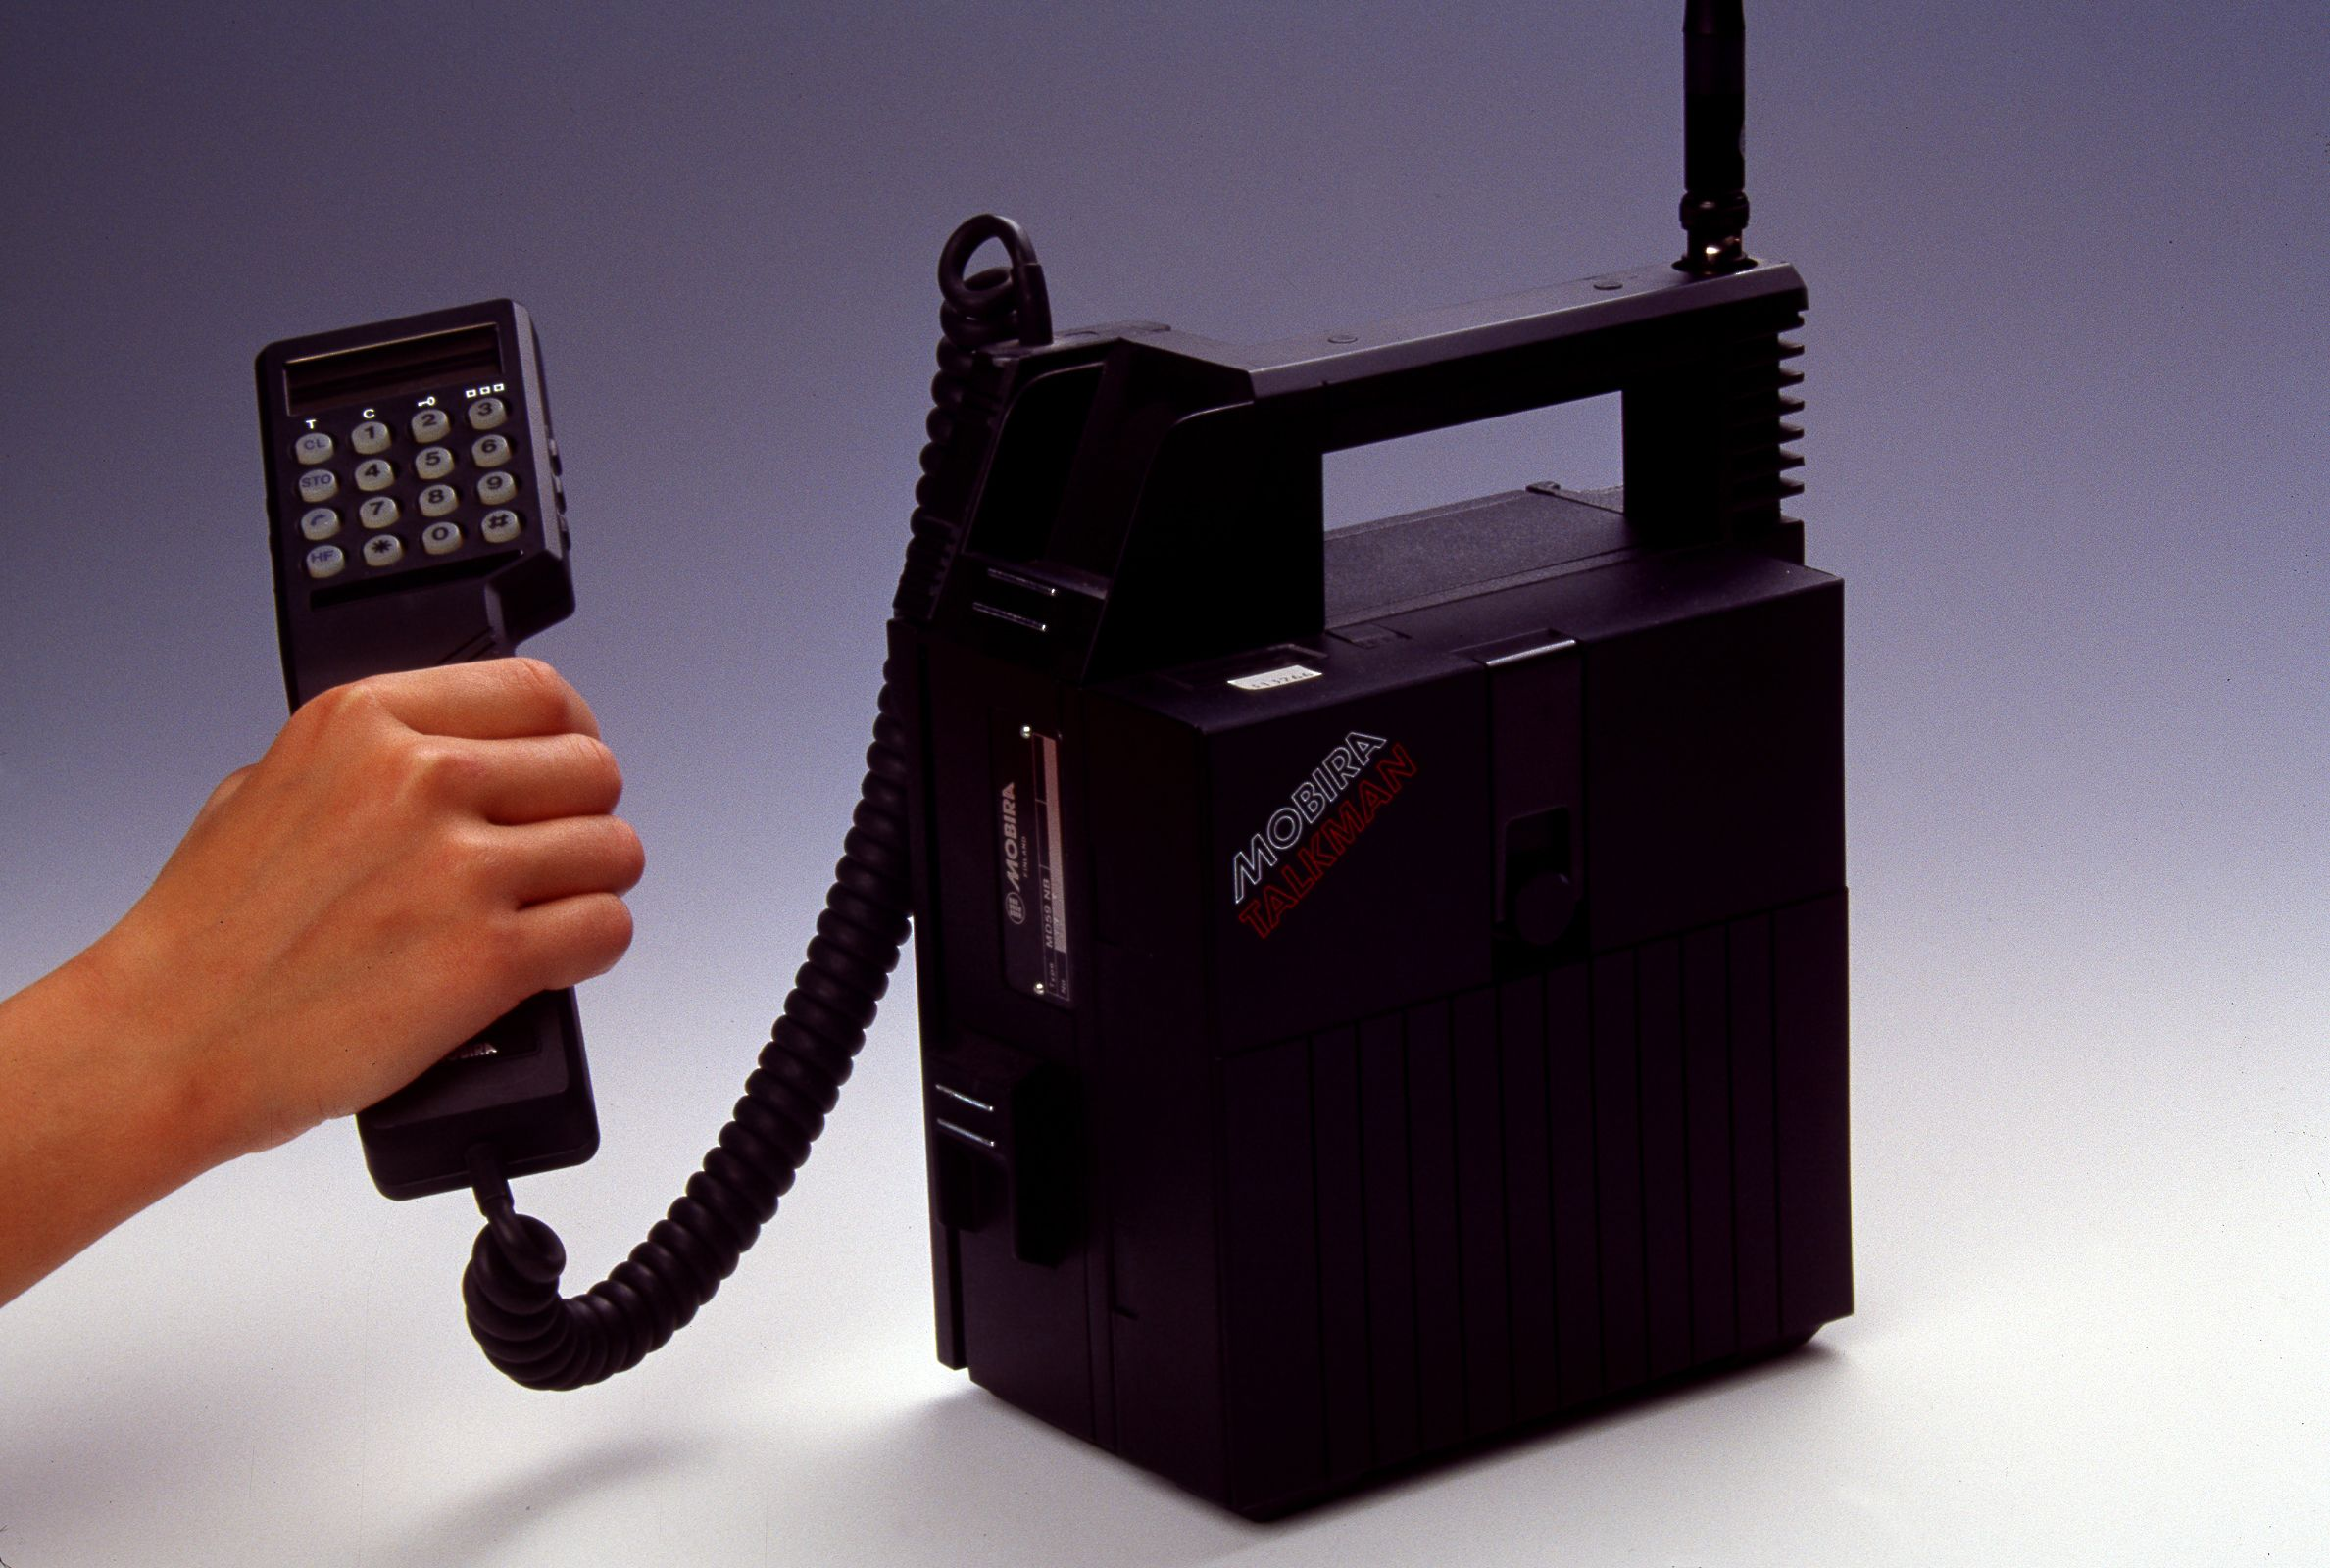 Nokia Mobira Talkman, en portabel NMT450 for bilmontering. Lansert 1984.